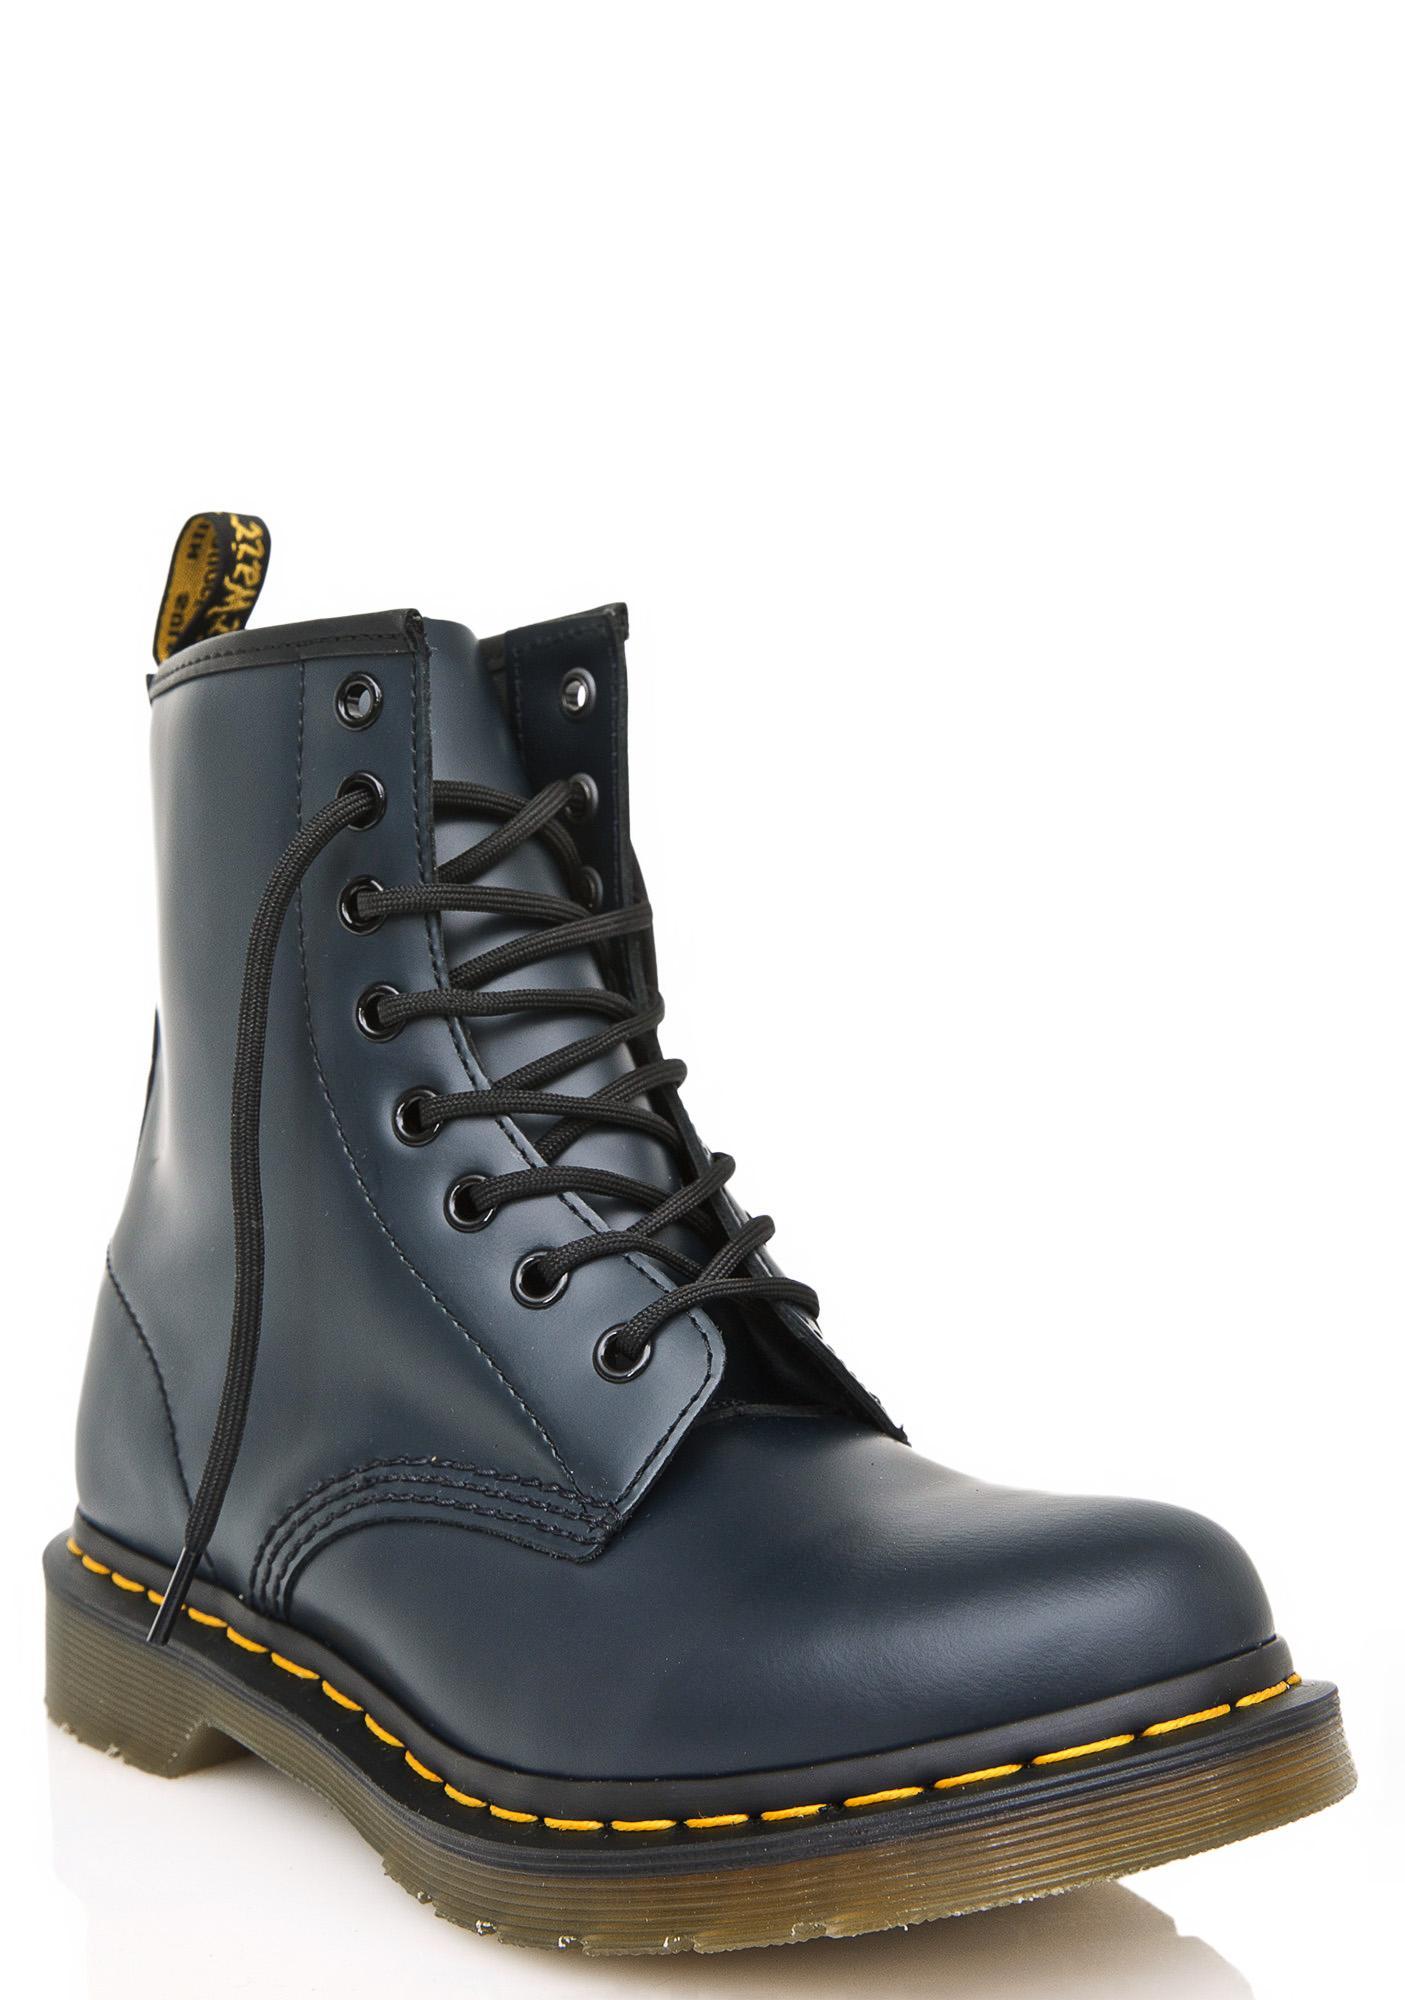 Dr. Martens Navy 1460 8 Eye Boots